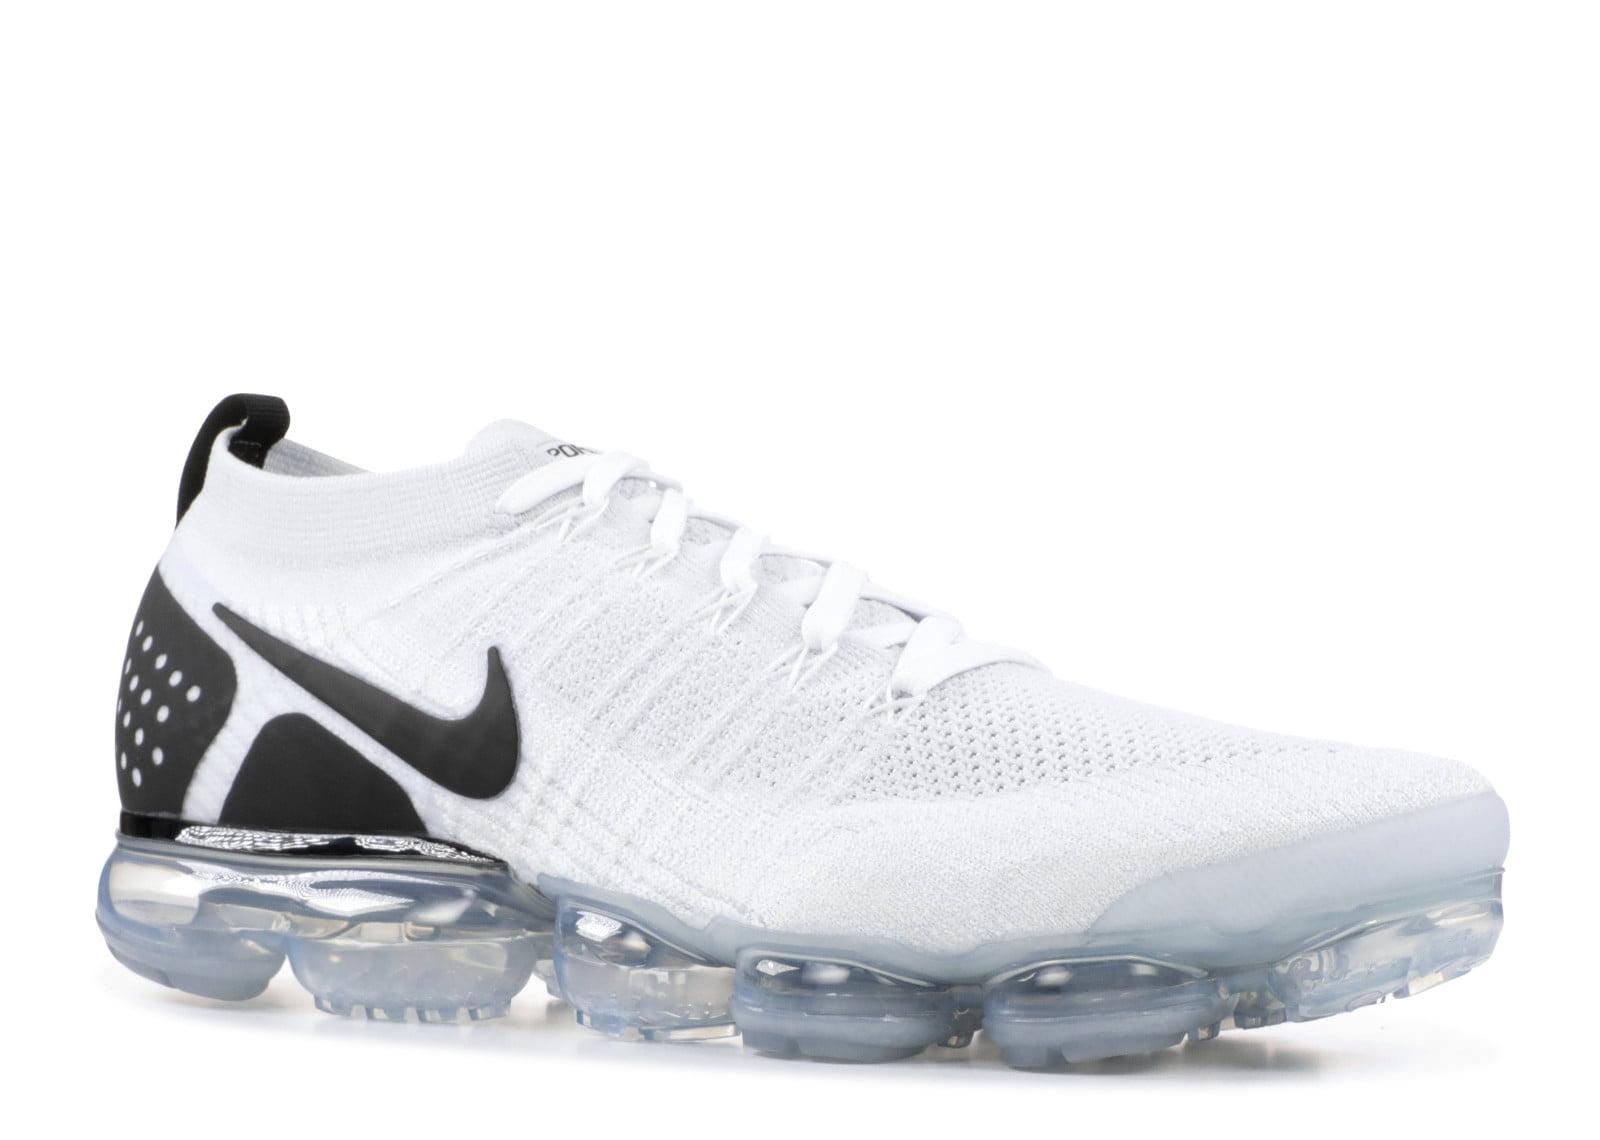 Nike Air Vapormax Flyknit 2 'Reverse